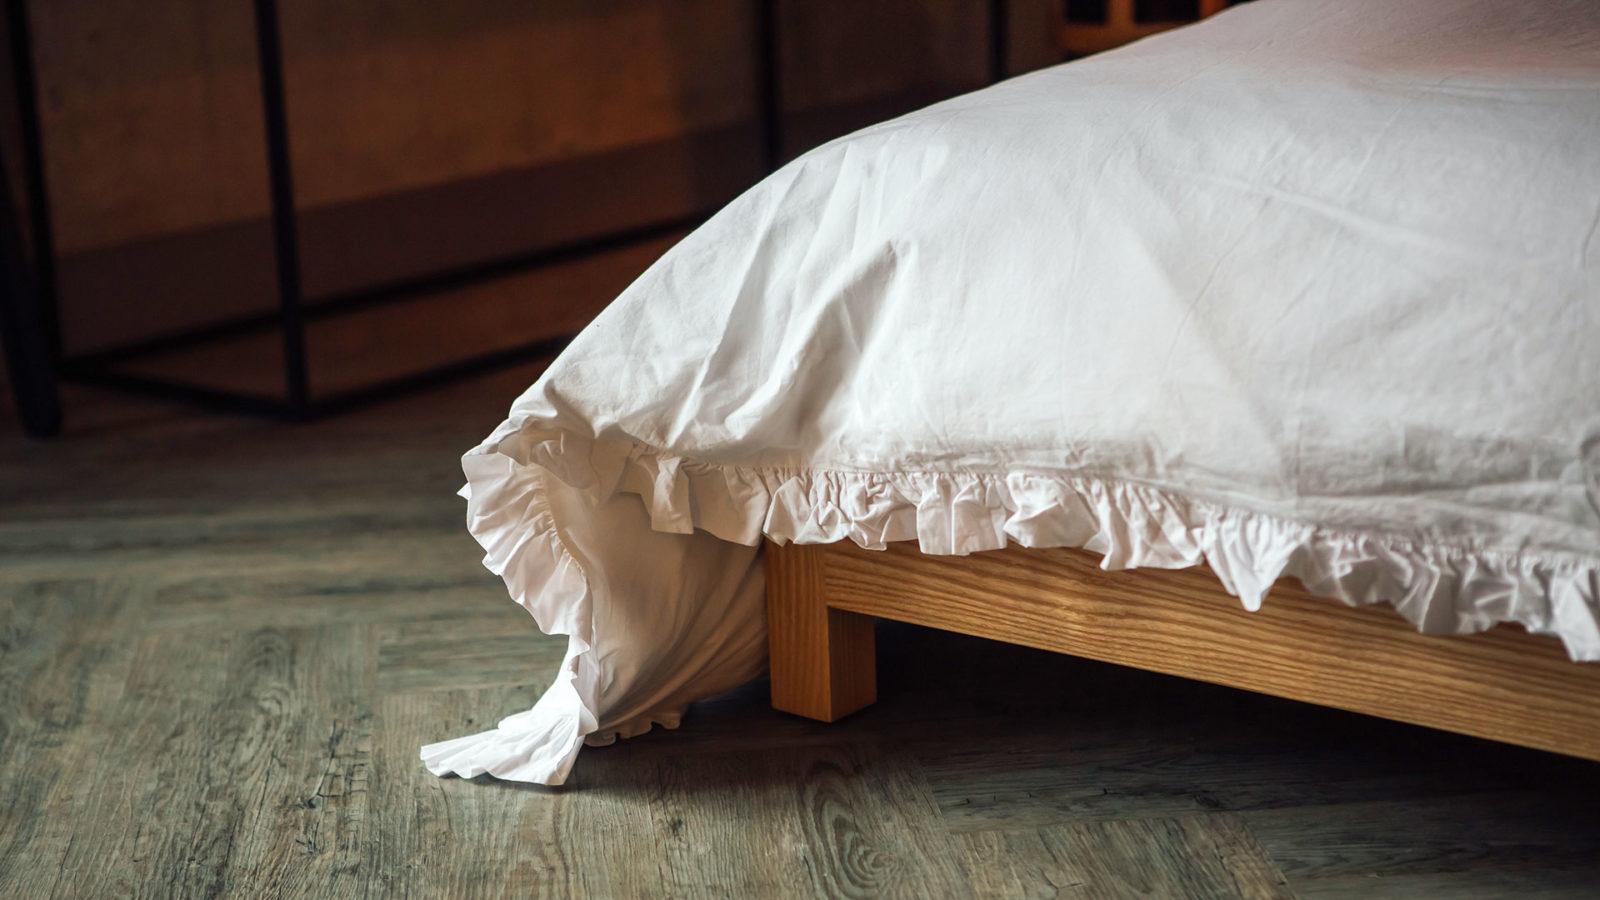 white-ruffle-cotton-bedding-close-up-corner